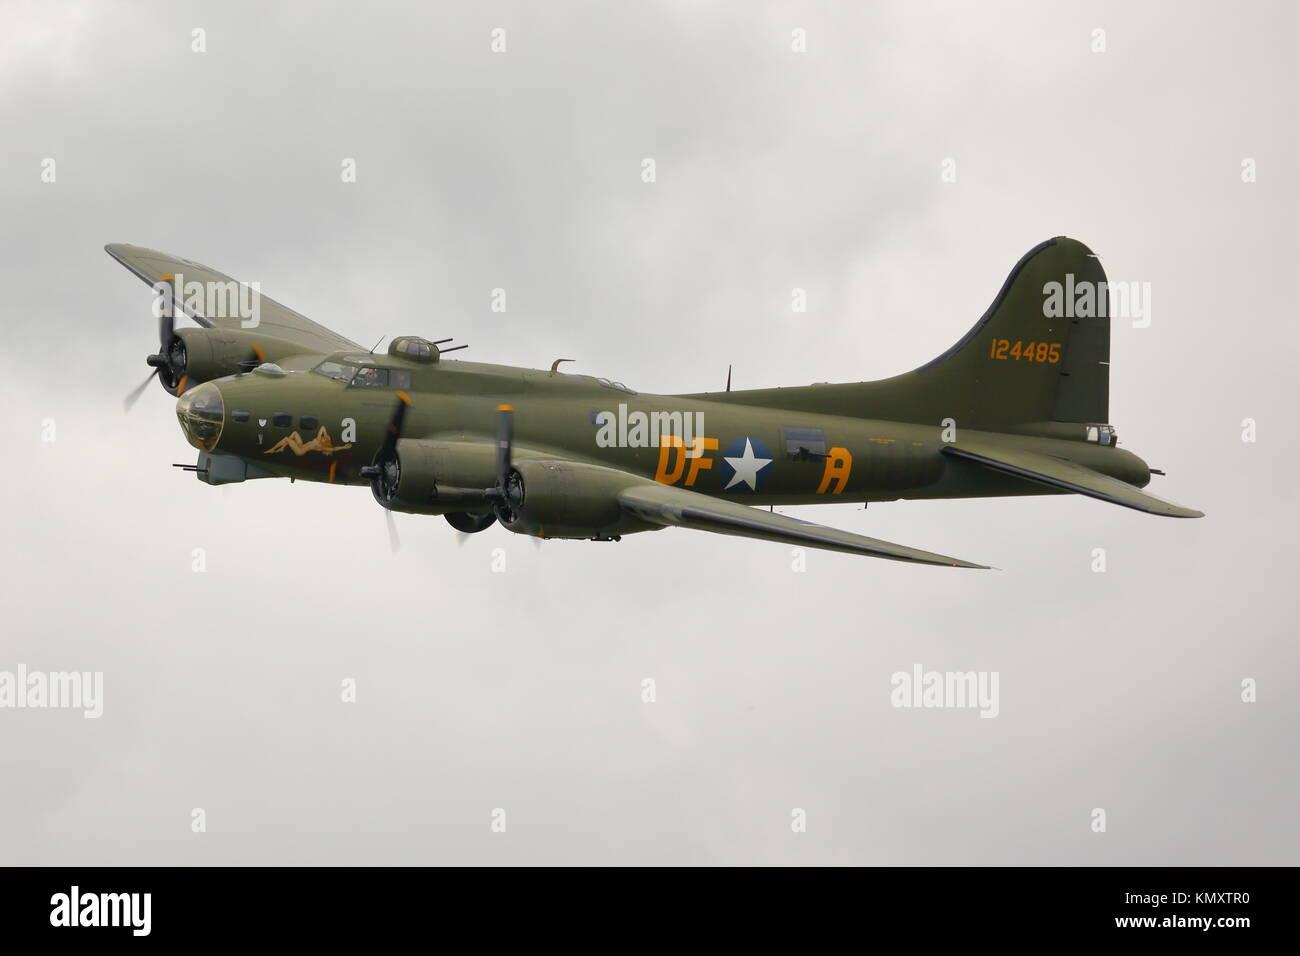 Biggin Hill Festival Of Flight >> Boeing B 17 Flying Fortress Stock Photos & Boeing B 17 Flying Fortress Stock Images - Alamy